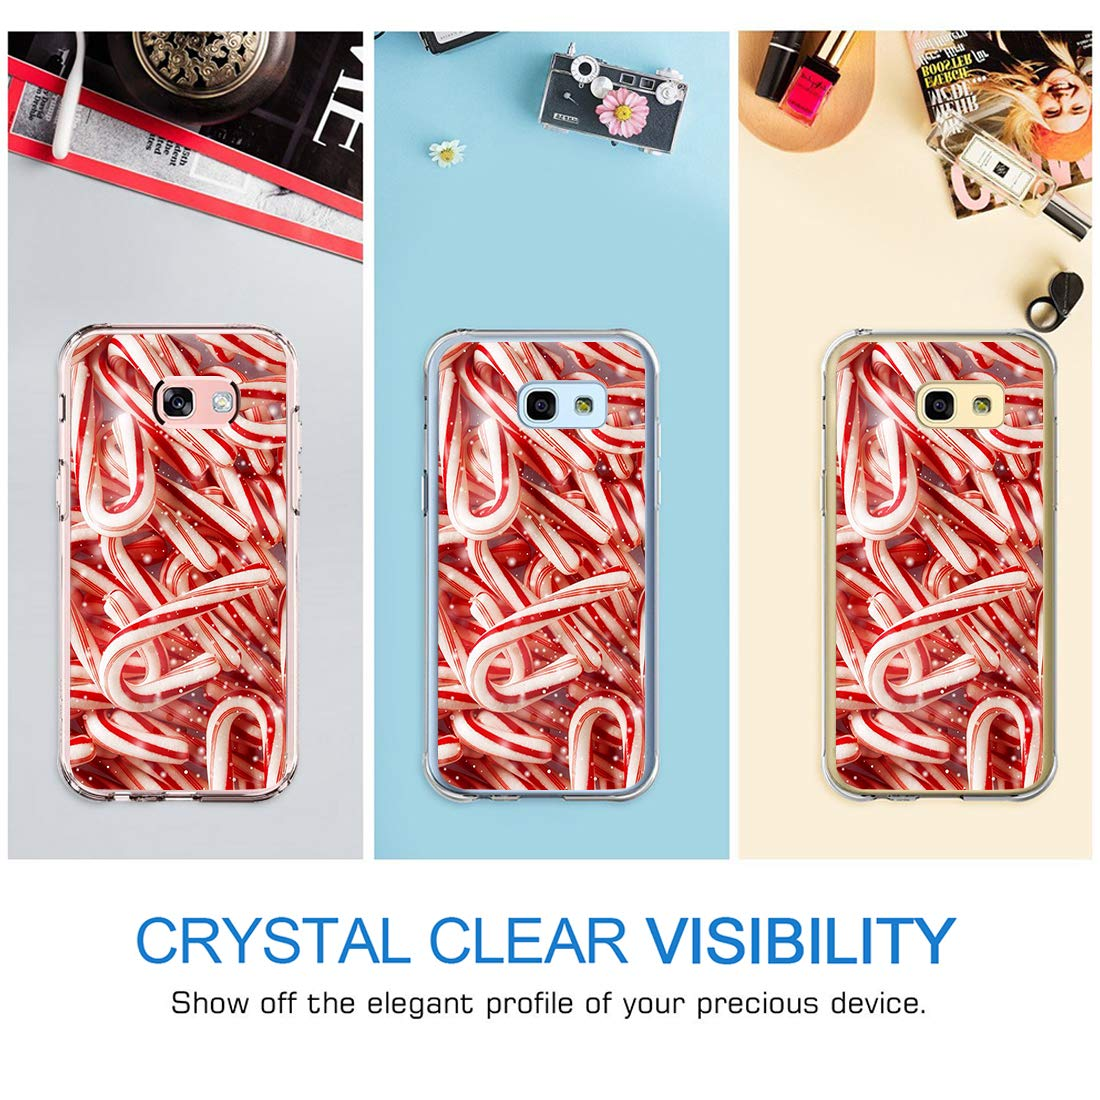 18eay Kompatibel mit Samsung Galaxy A5 2017 H/ülle Crystal Clear Cover Transparent Weiche Silikon Handyh/ülle Sto/ßfest Schutzh/ülle f/ür Samsung Galaxy A5 2017